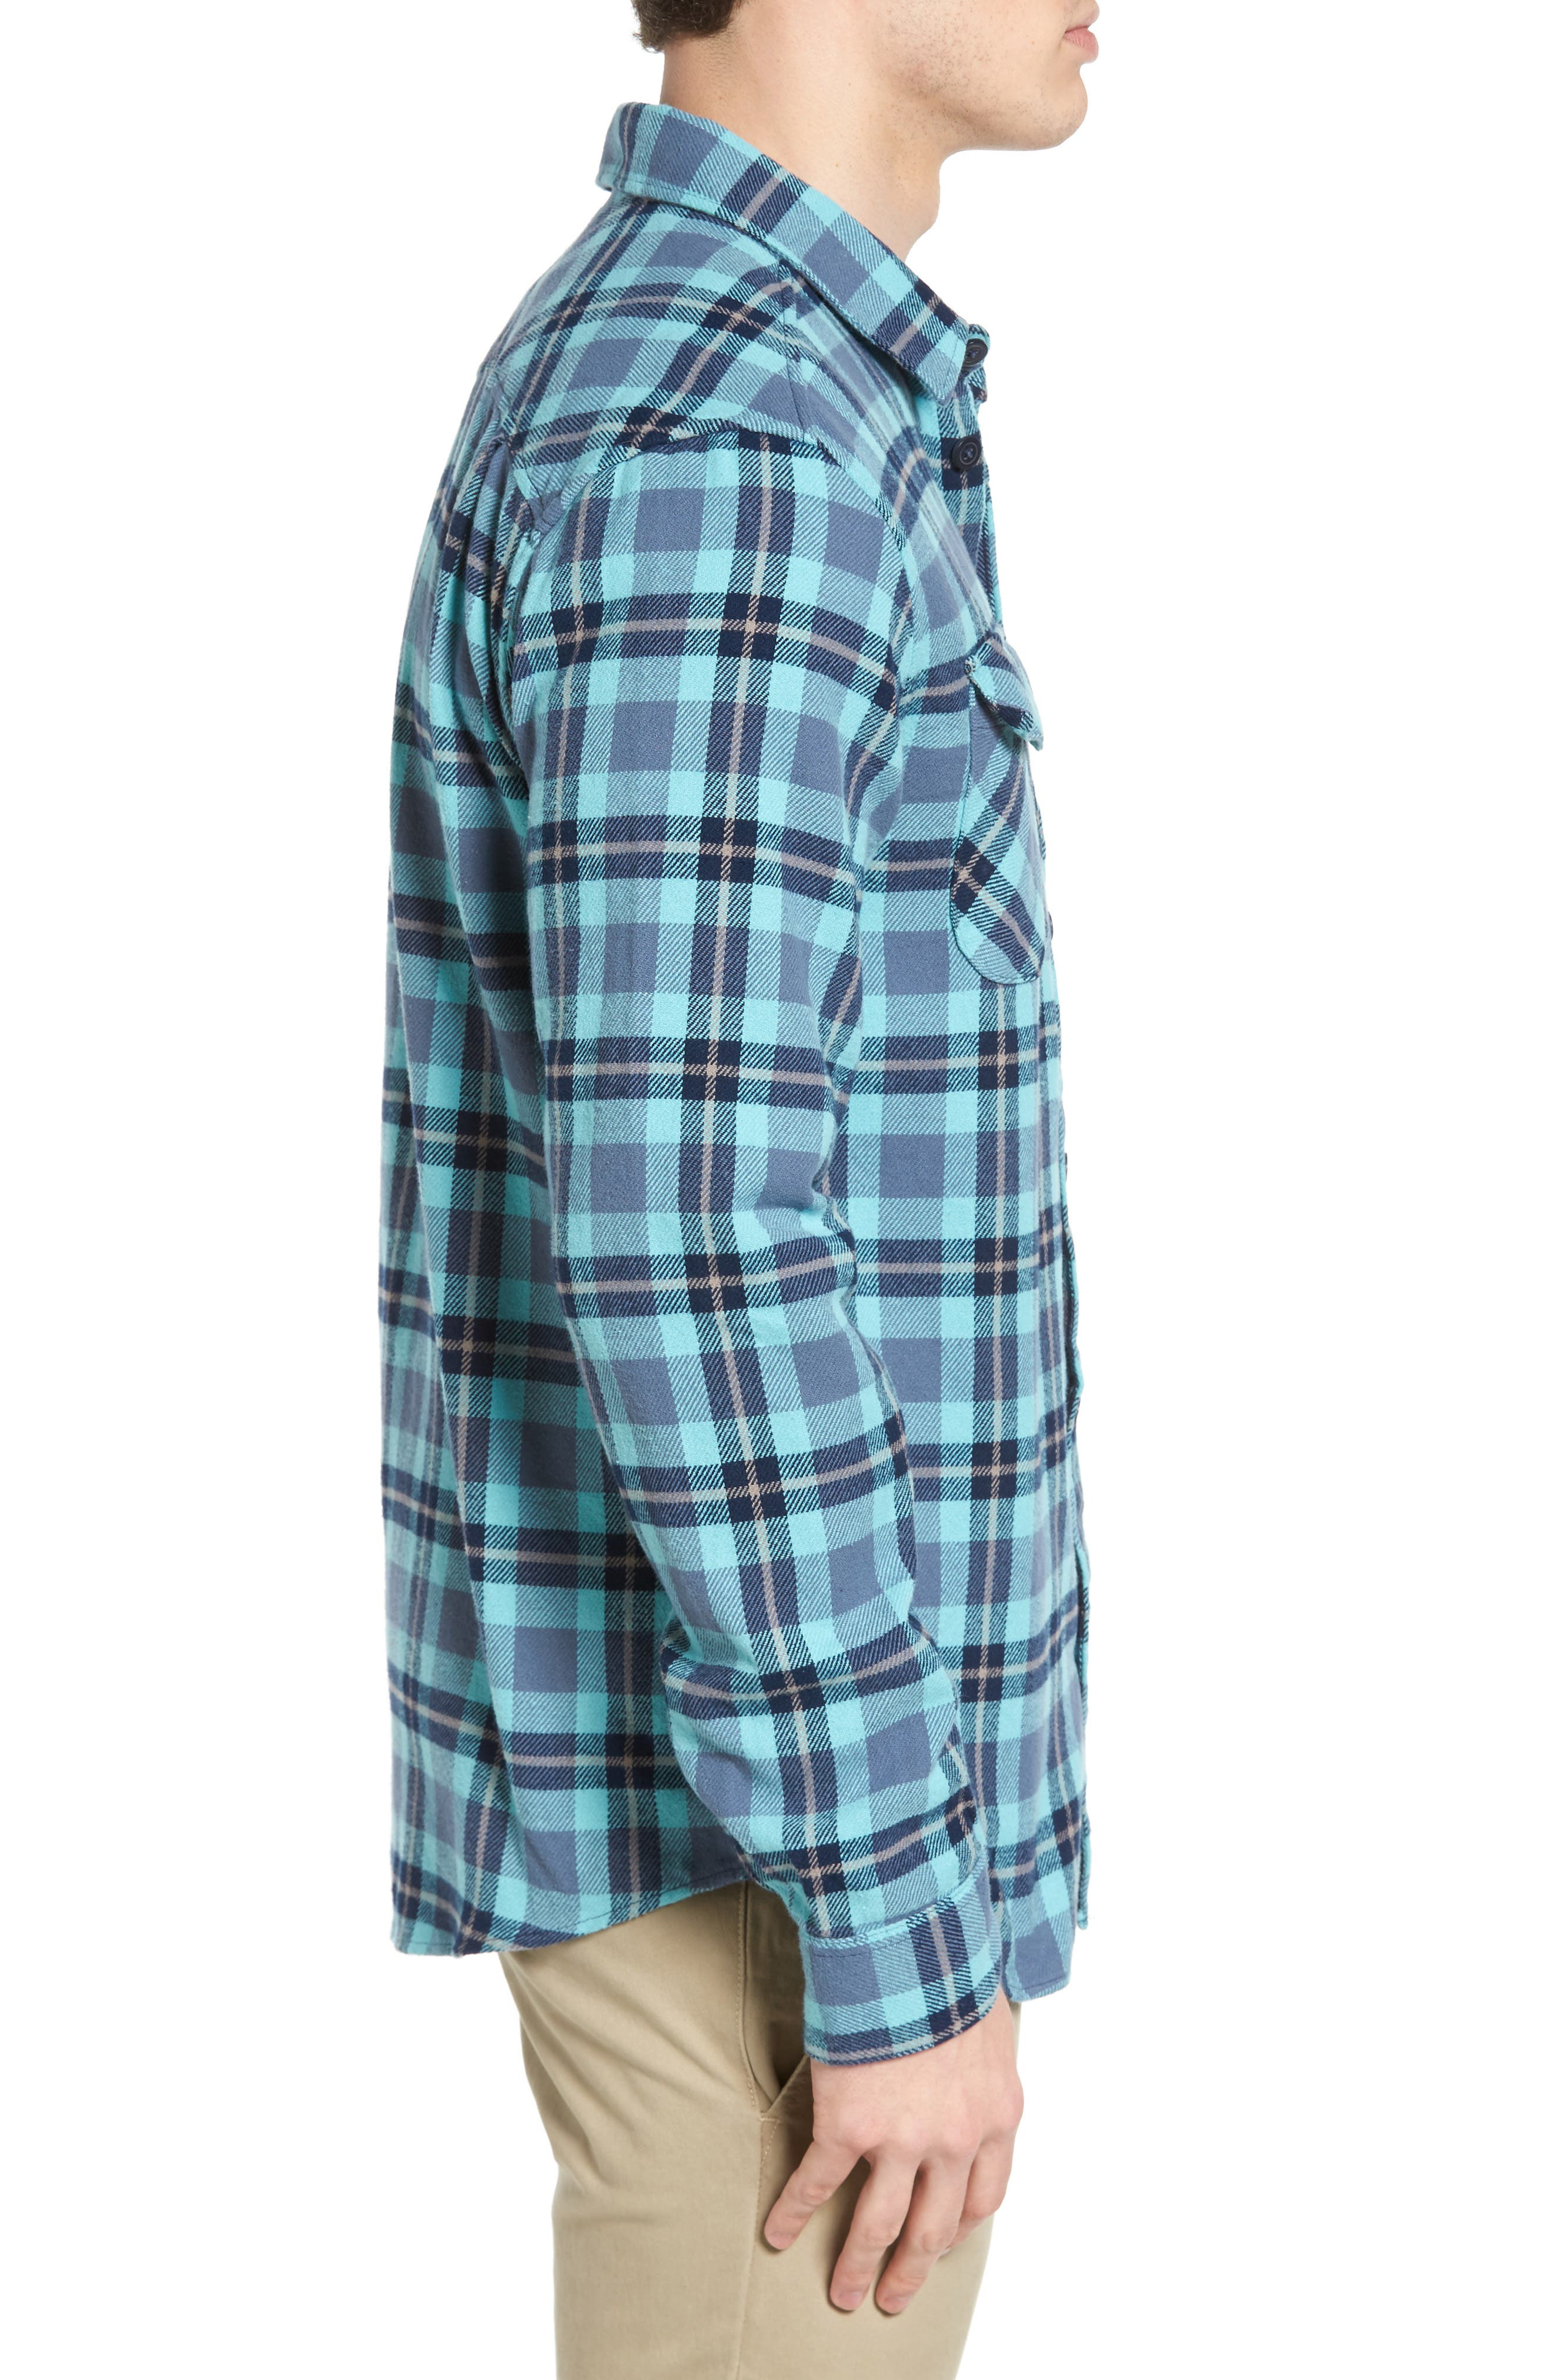 'That'll Work' Trim Fit Plaid Flannel Shirt,                             Alternate thumbnail 18, color,